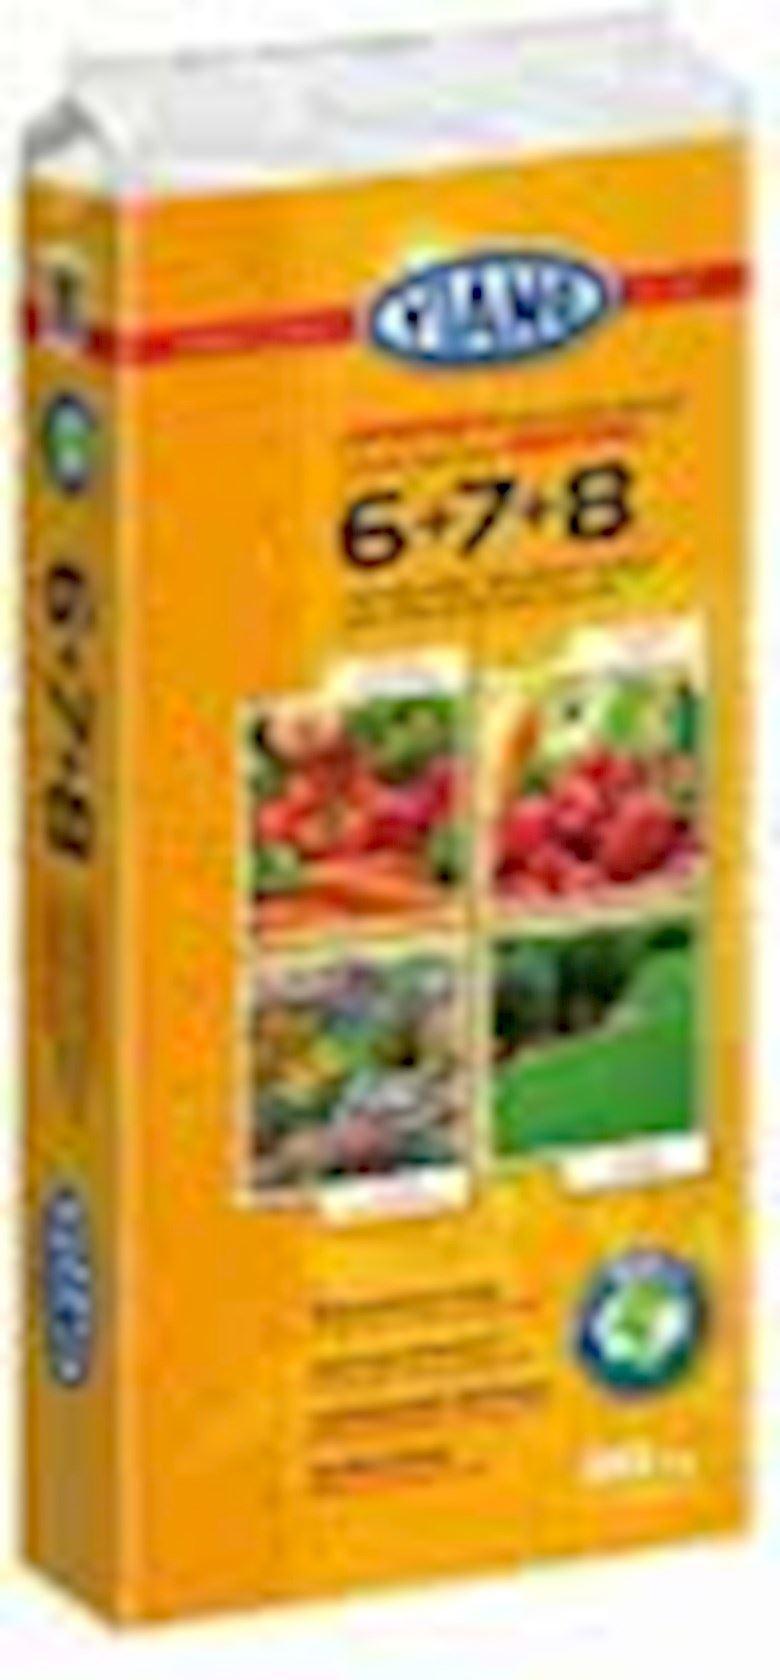 6-7-8-Universele-BIO-Meststof-met-bacterien-zak-5kg